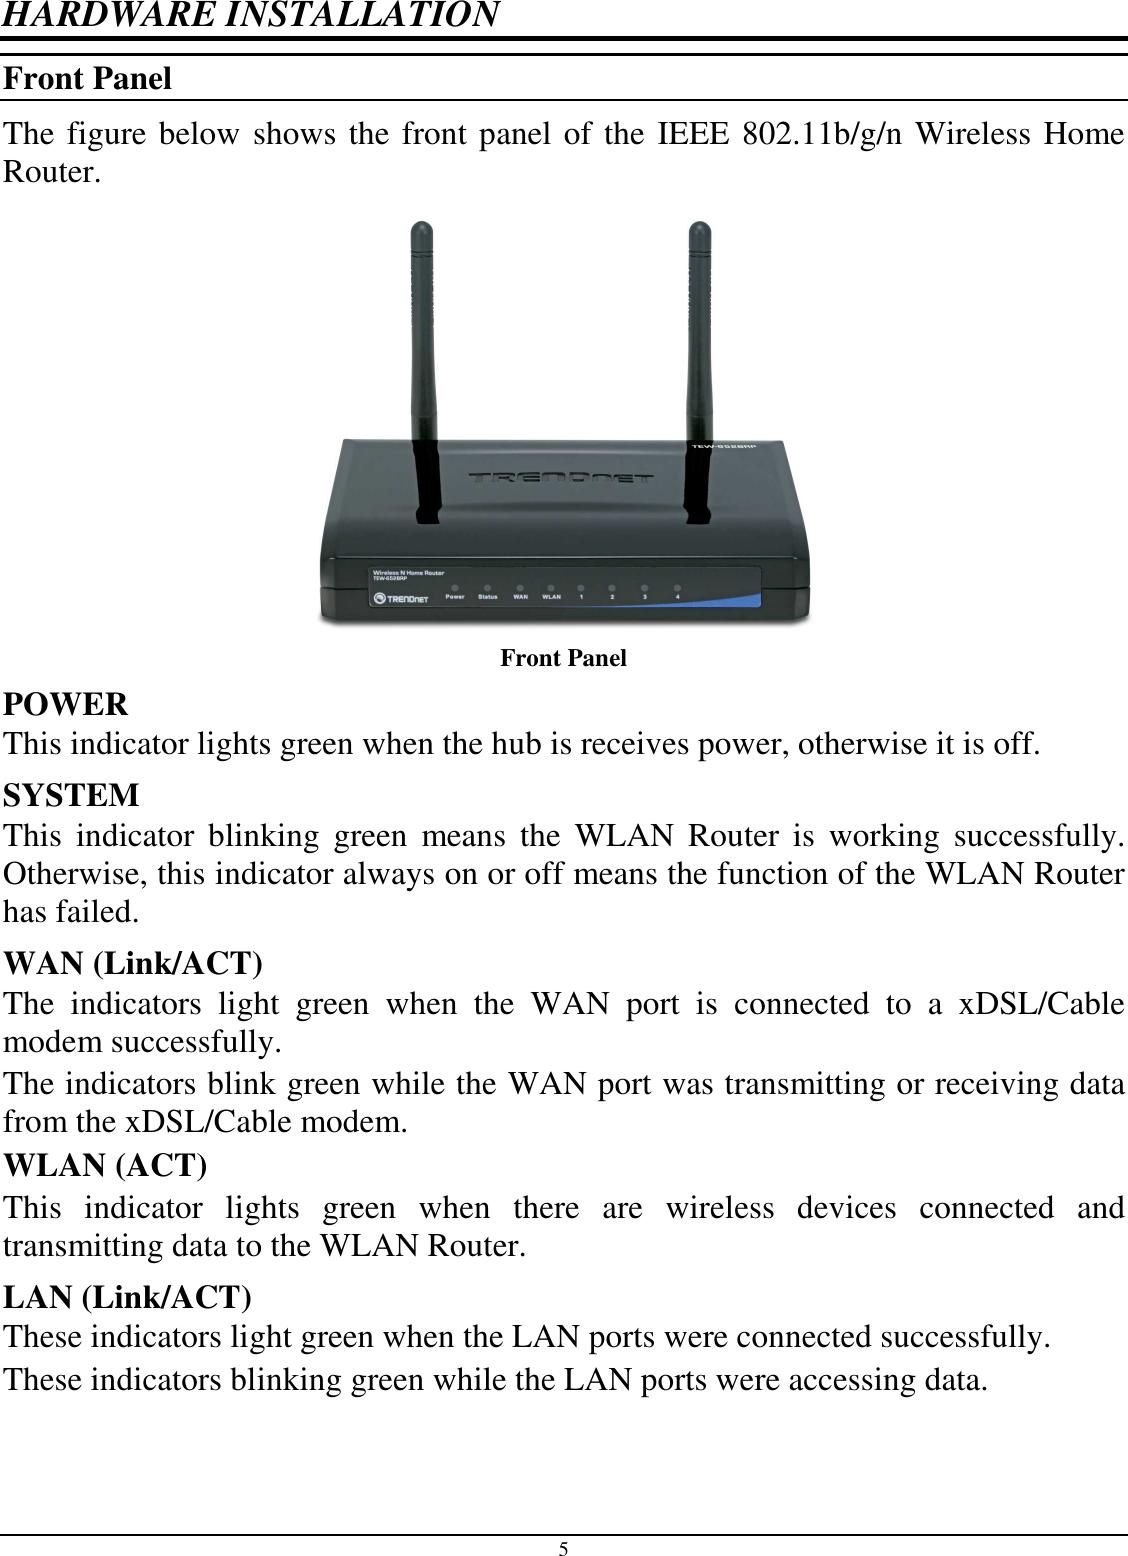 Trendnet Tew652brp 80211n Wireless Router User Manual Ug Tew 652brp N Home Diagram 5 Hardware Installation Front Panel The Figure Below Shows Of Ieee 80211